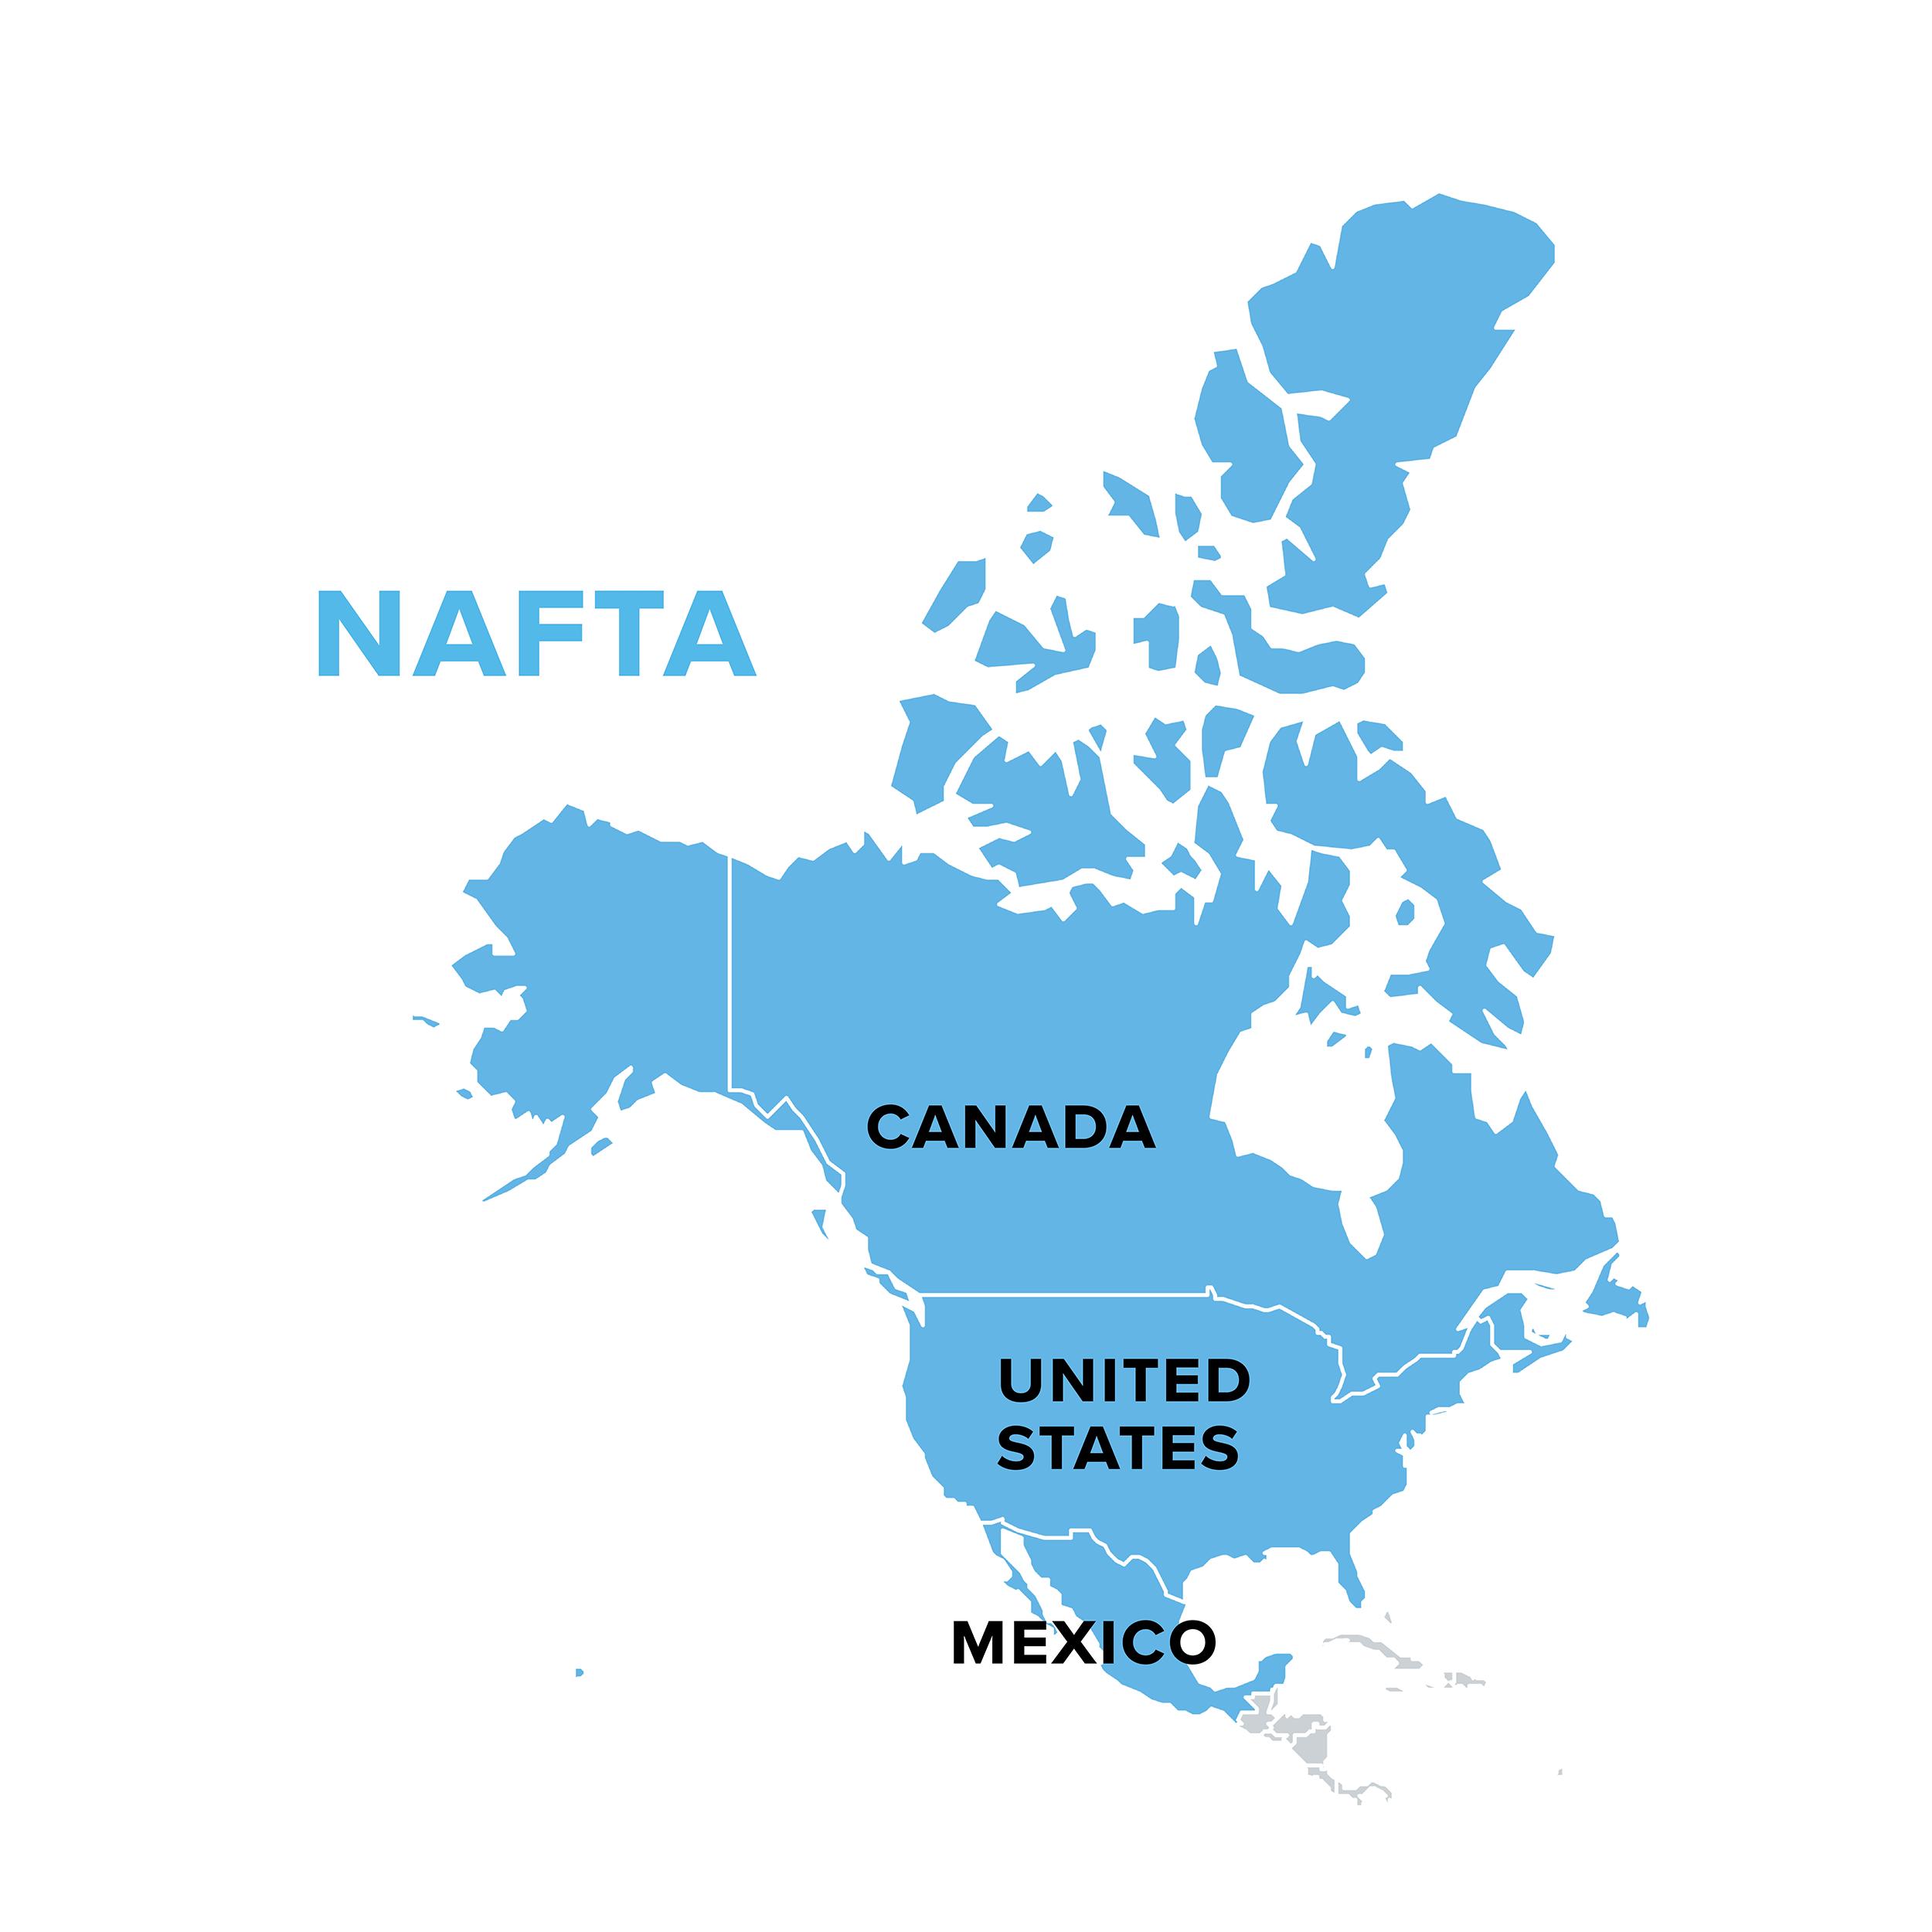 Maps_Trade_Blocks_JULY2016_NAFTA-1